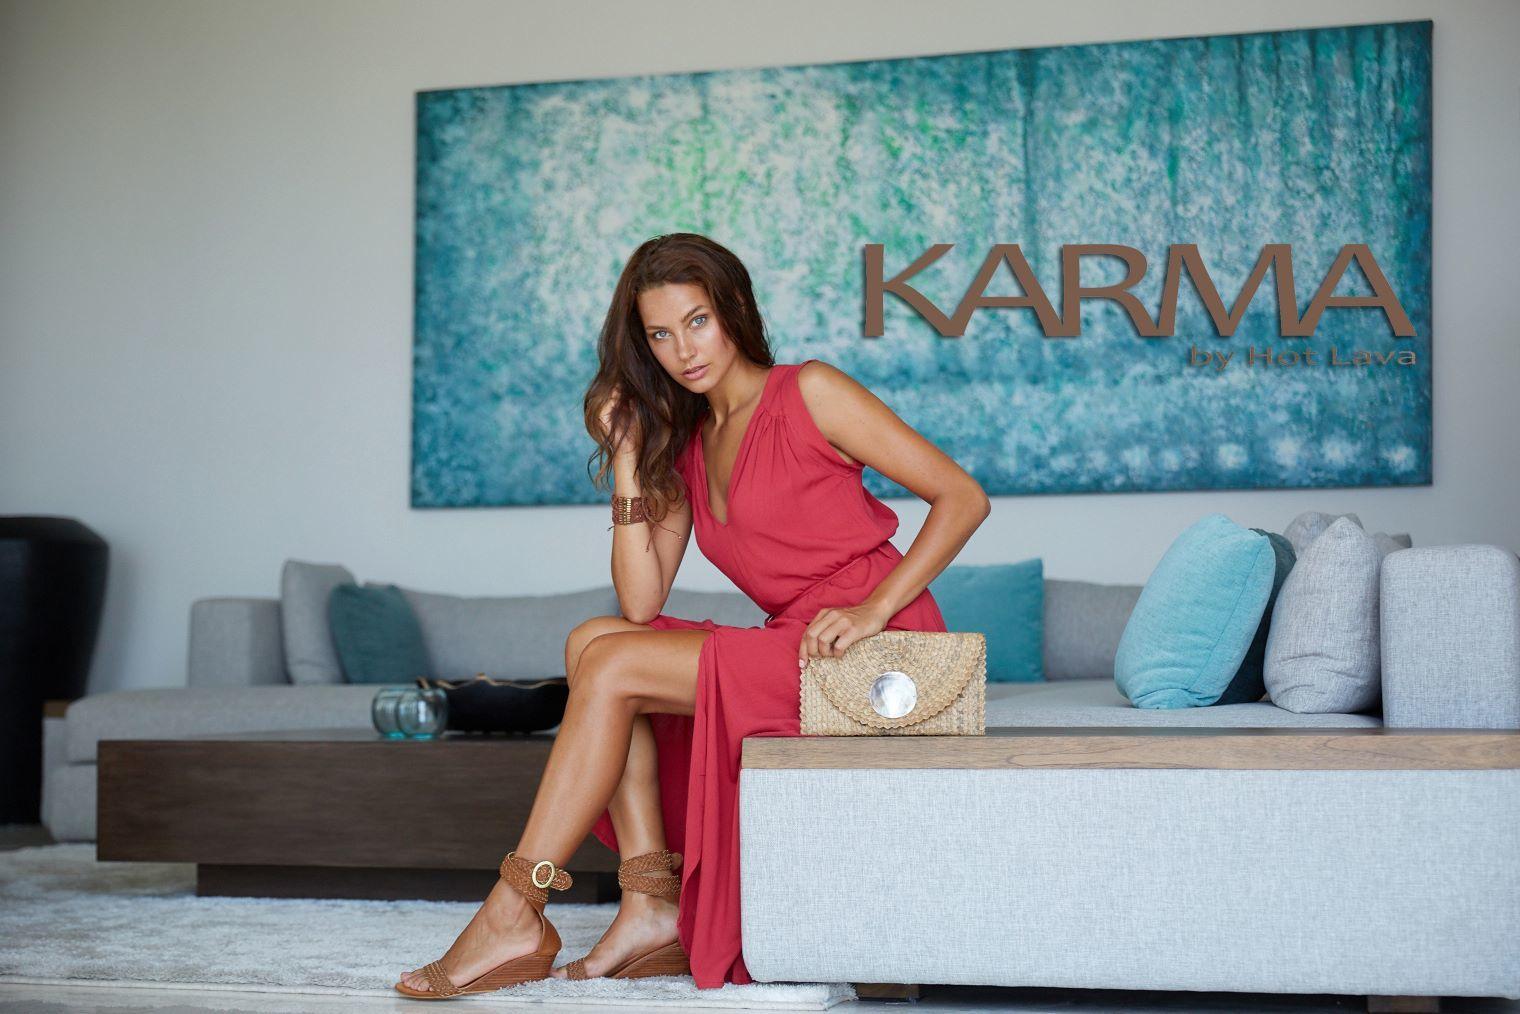 Karma by Hot Lava